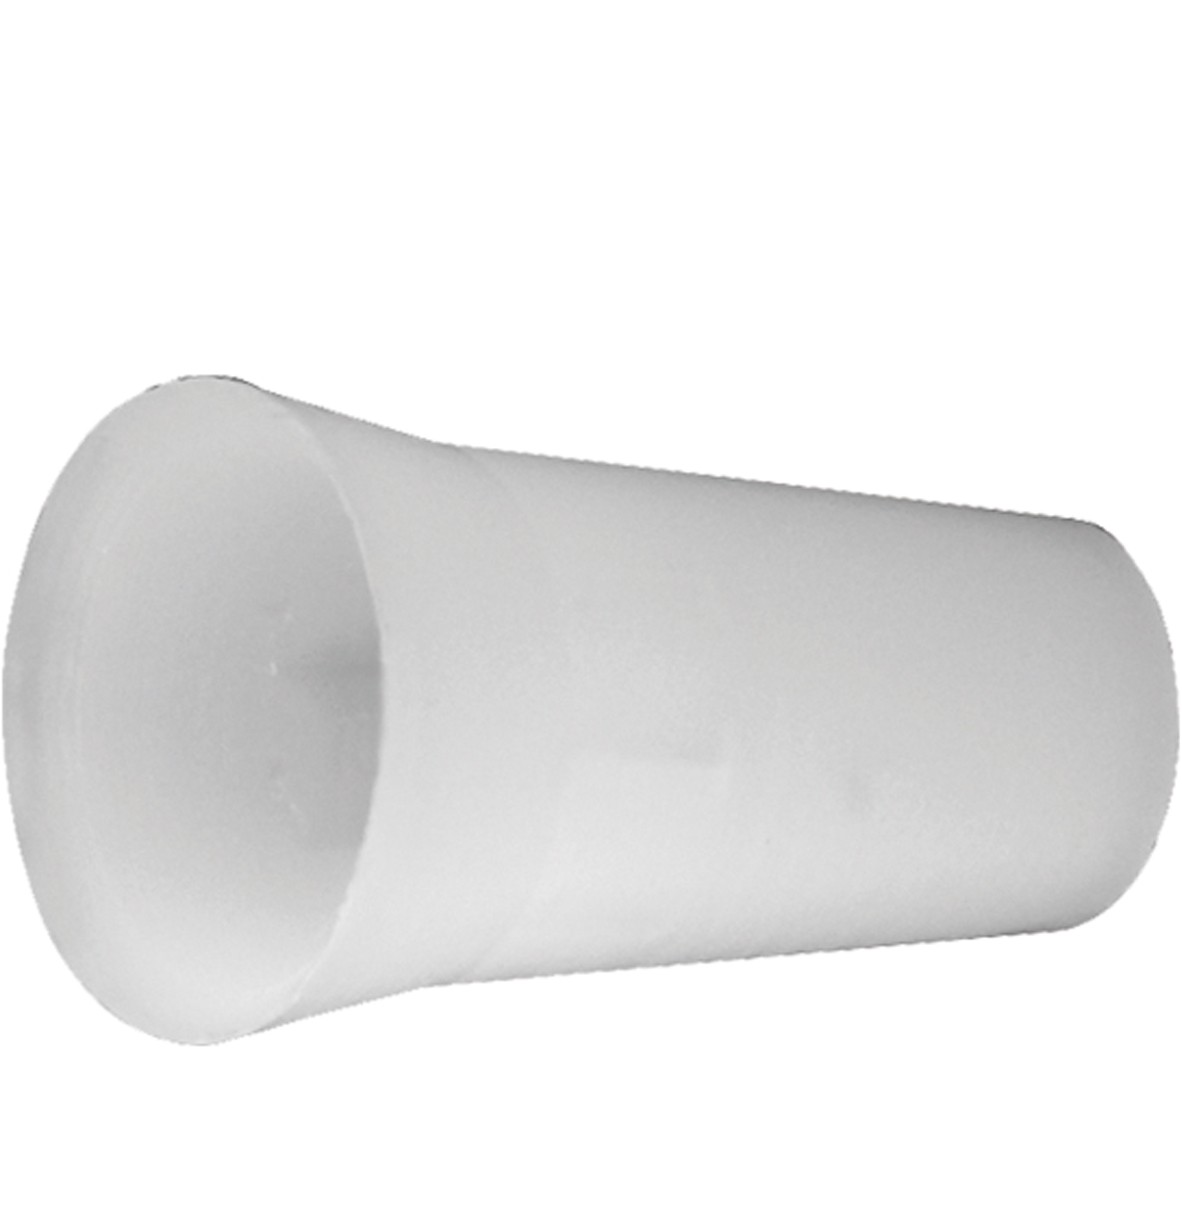 TL RP Kunststoffkappe, Krone für 31161